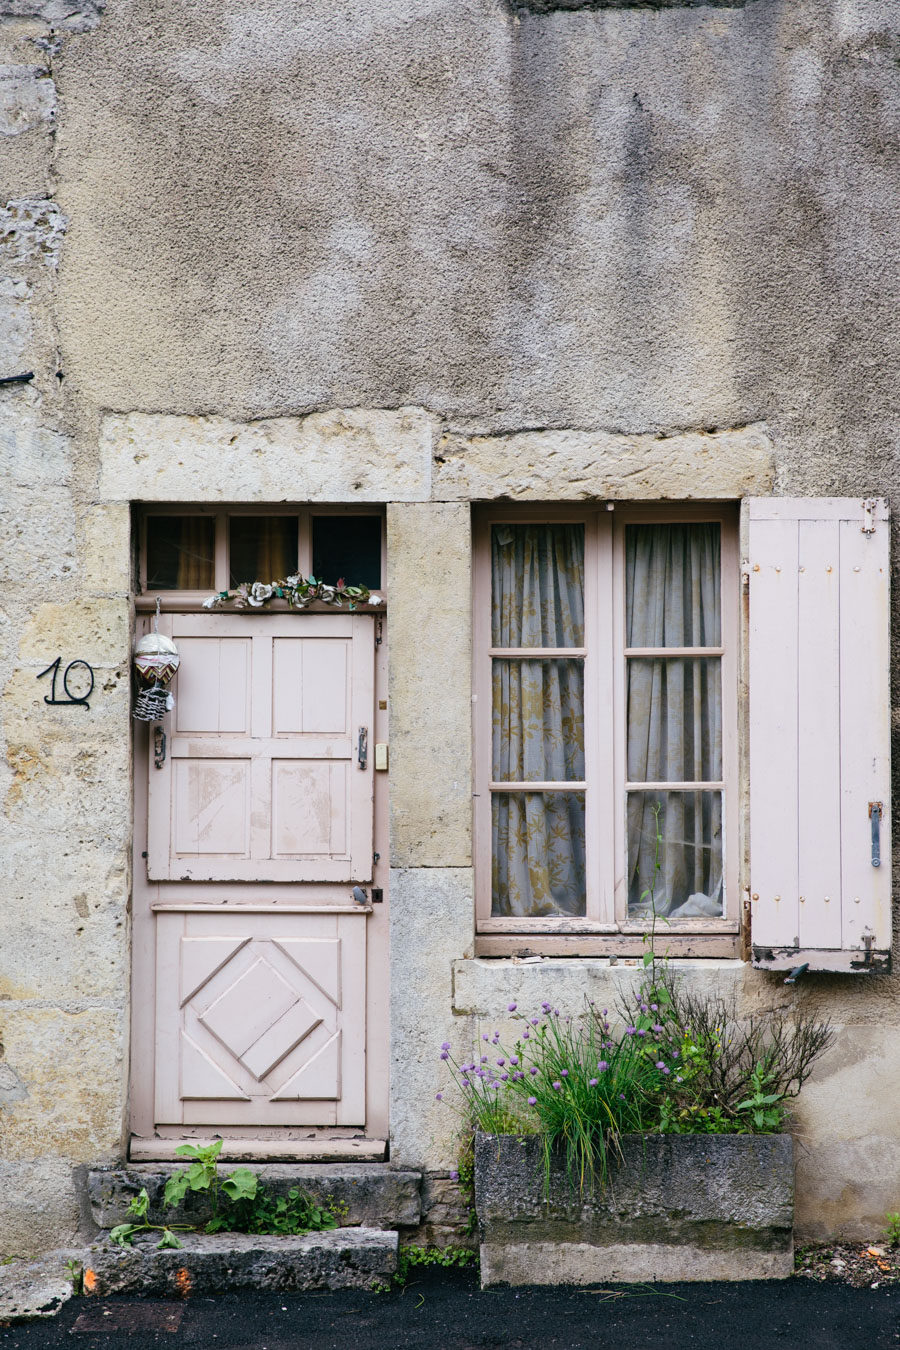 Beautiful towns Flavigny-sur-Ozerain - France